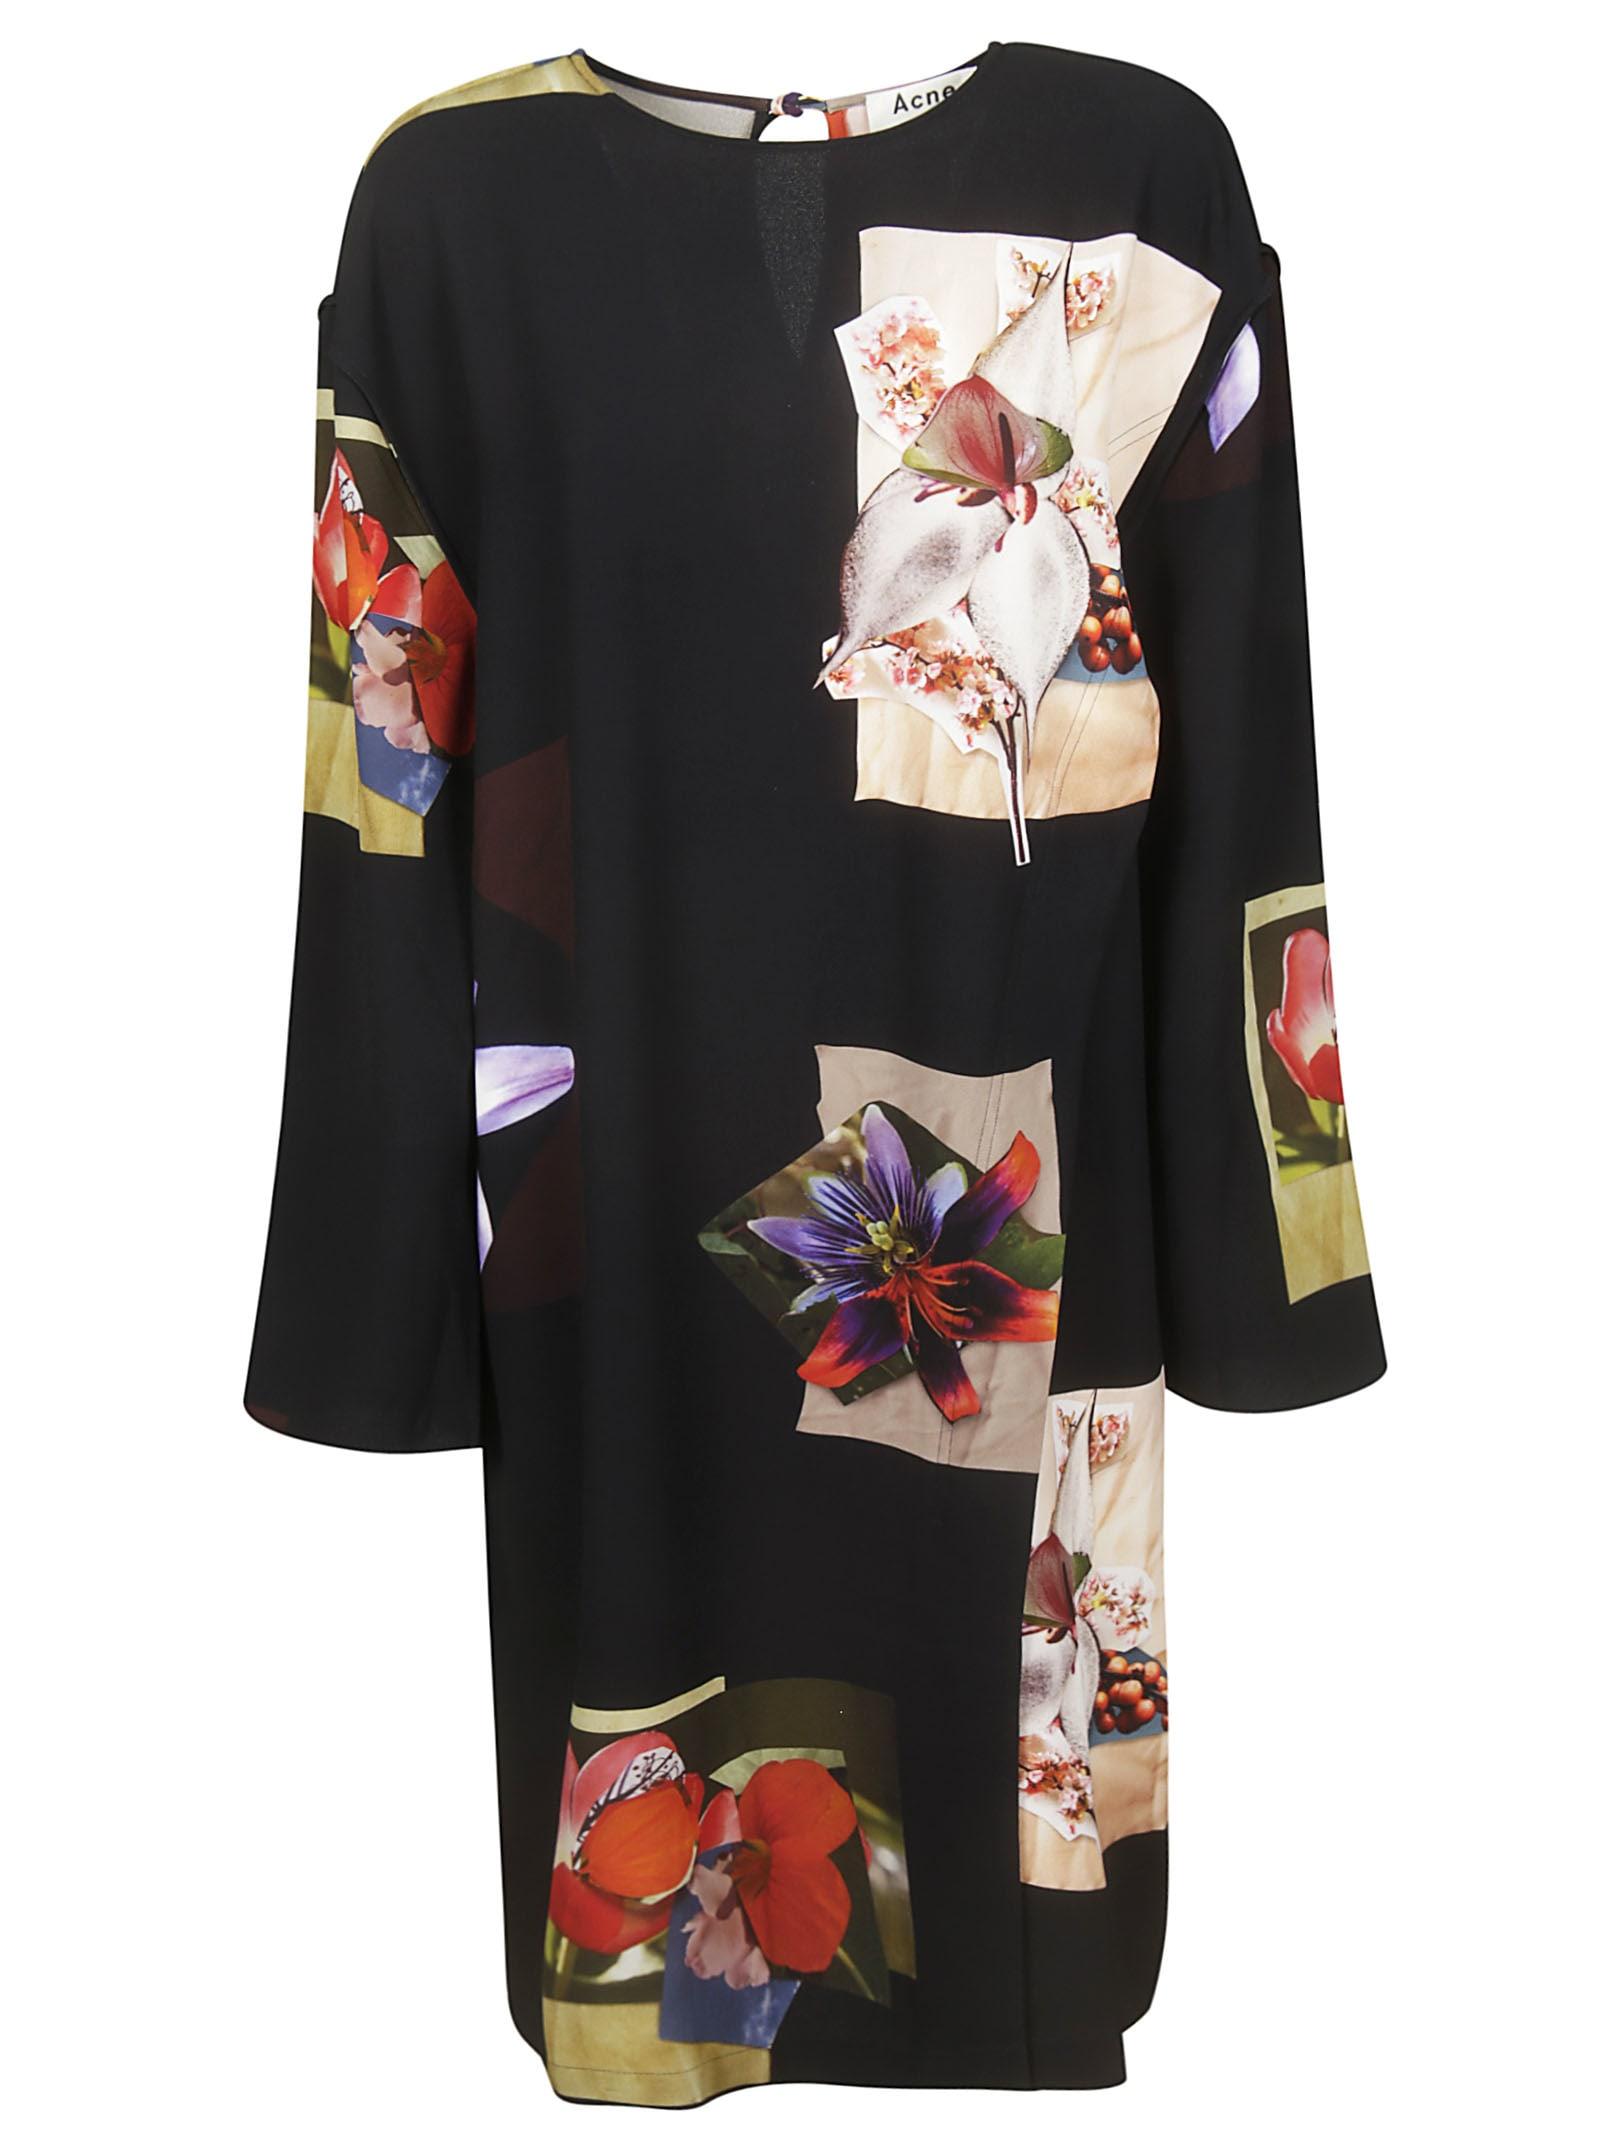 Acne Studios Printed Dress